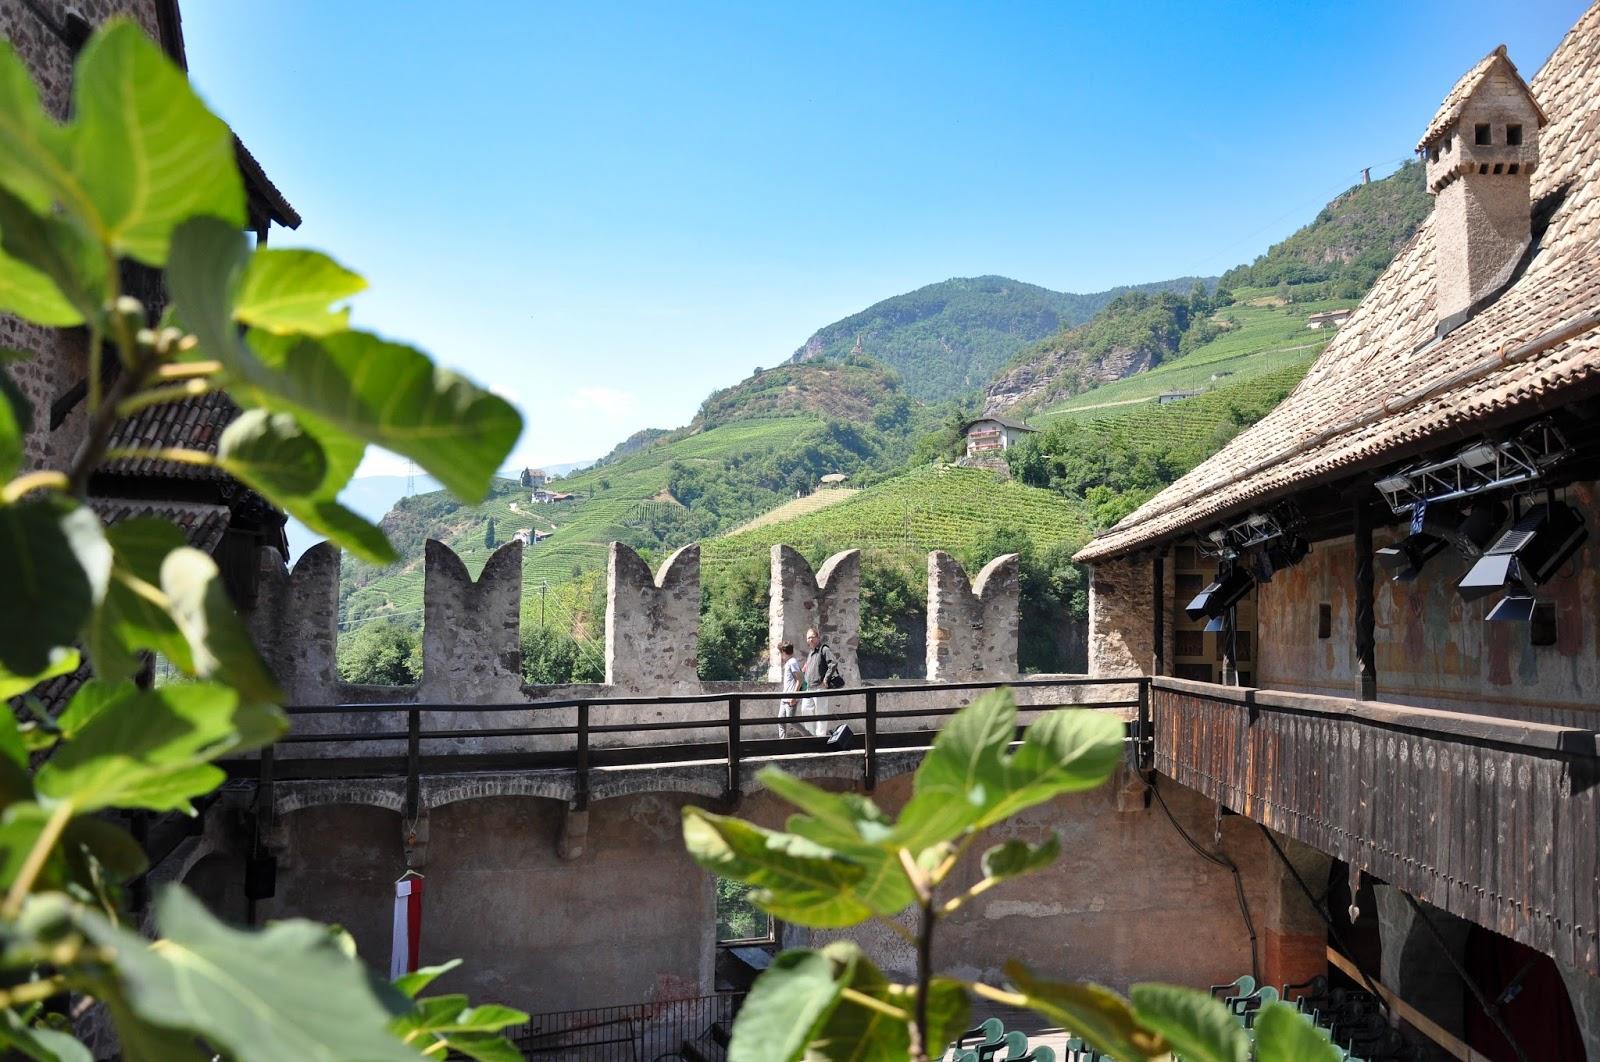 Inside Runkelstein Castle, Bolzano, South Tyrol, Italy